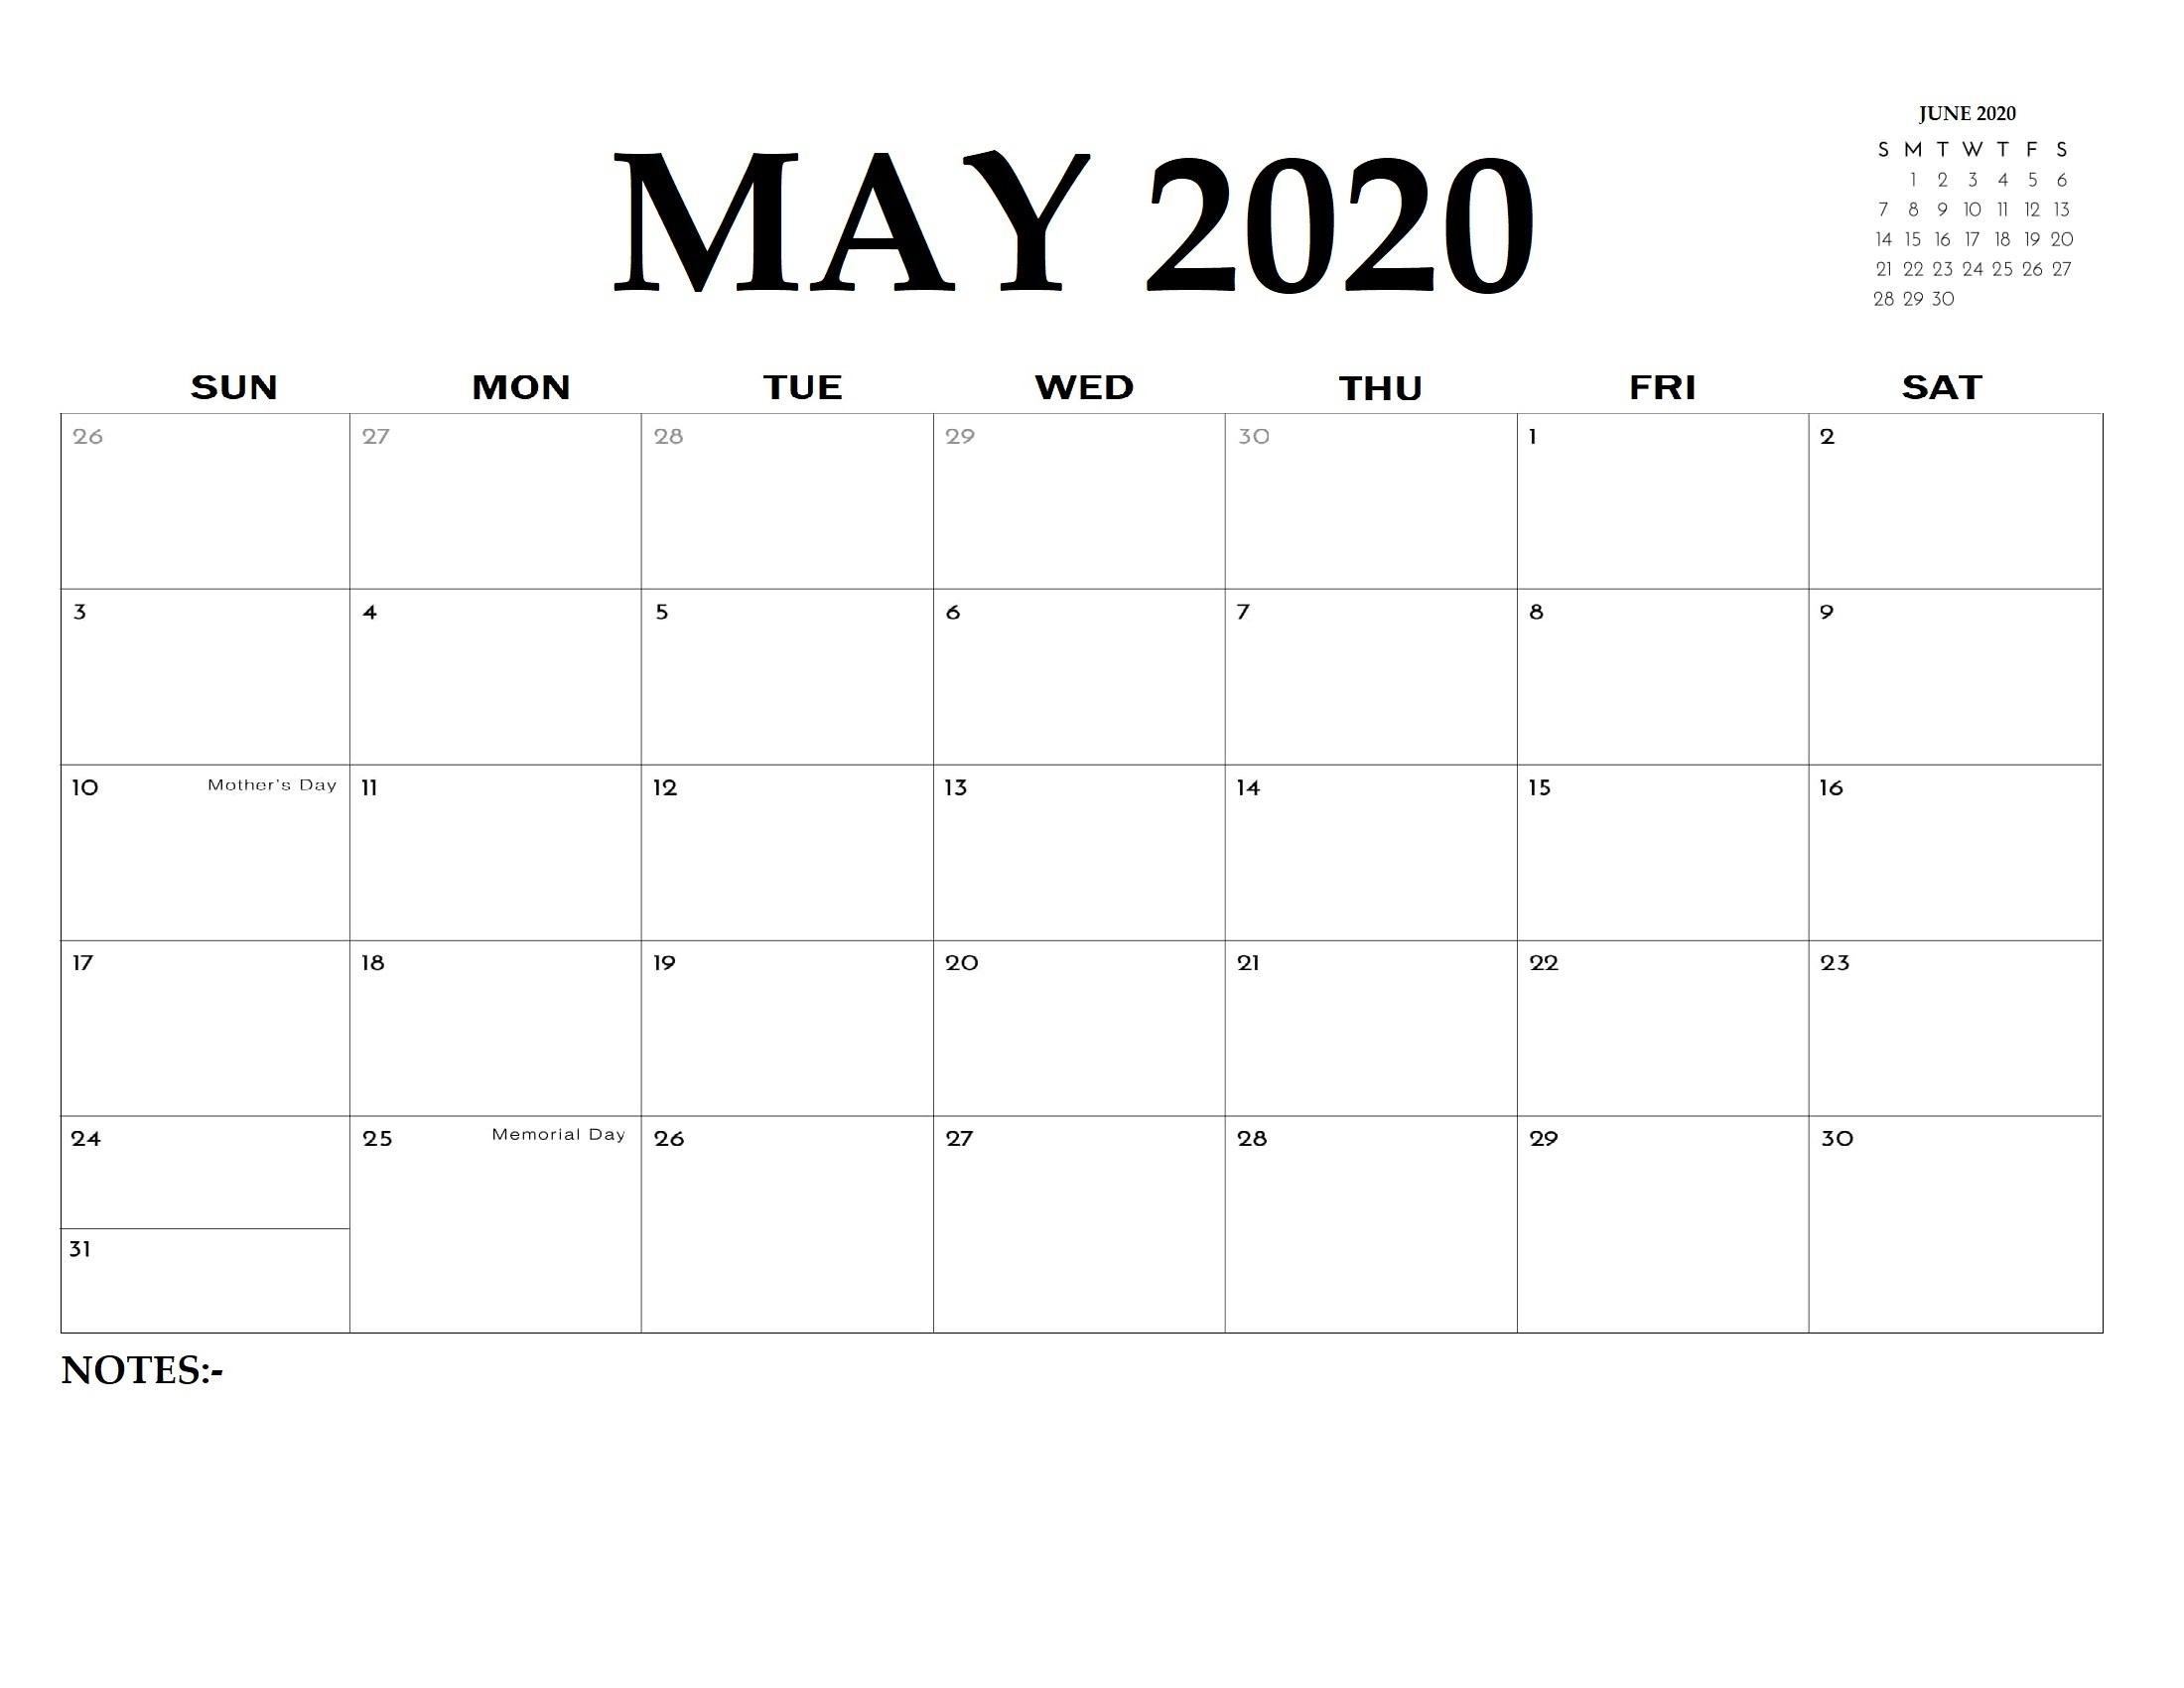 Free Printable May 2020 Calendar - Printable Calendar